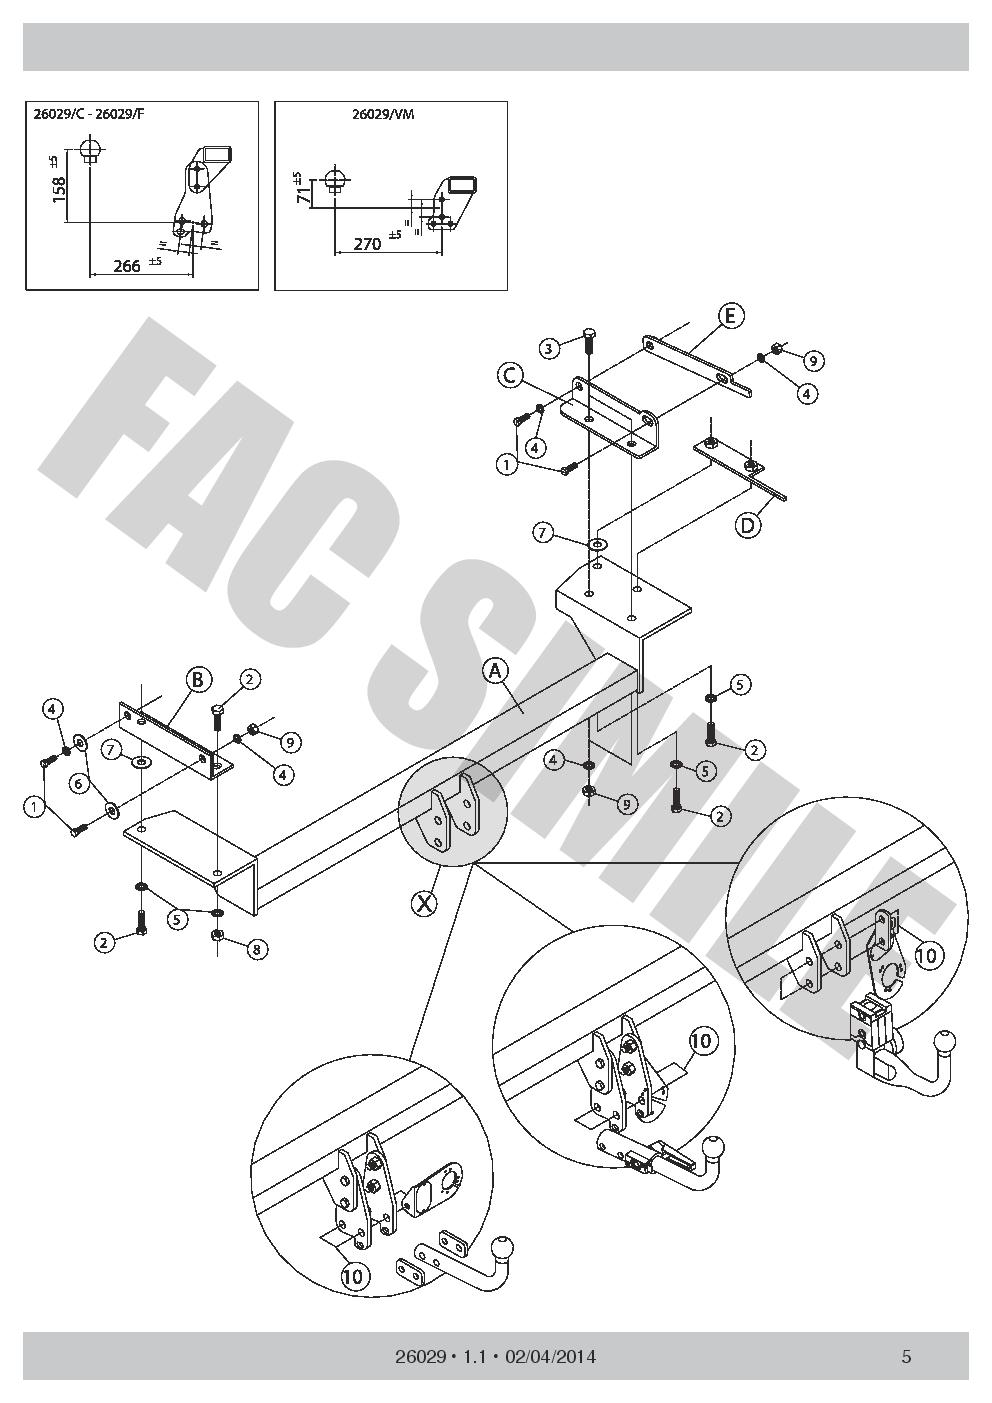 AHK Abnehmbare Anhängerkupplung 7p C2 E-Satz für Nissan QASHQAI+2 07-13 26029/_B2